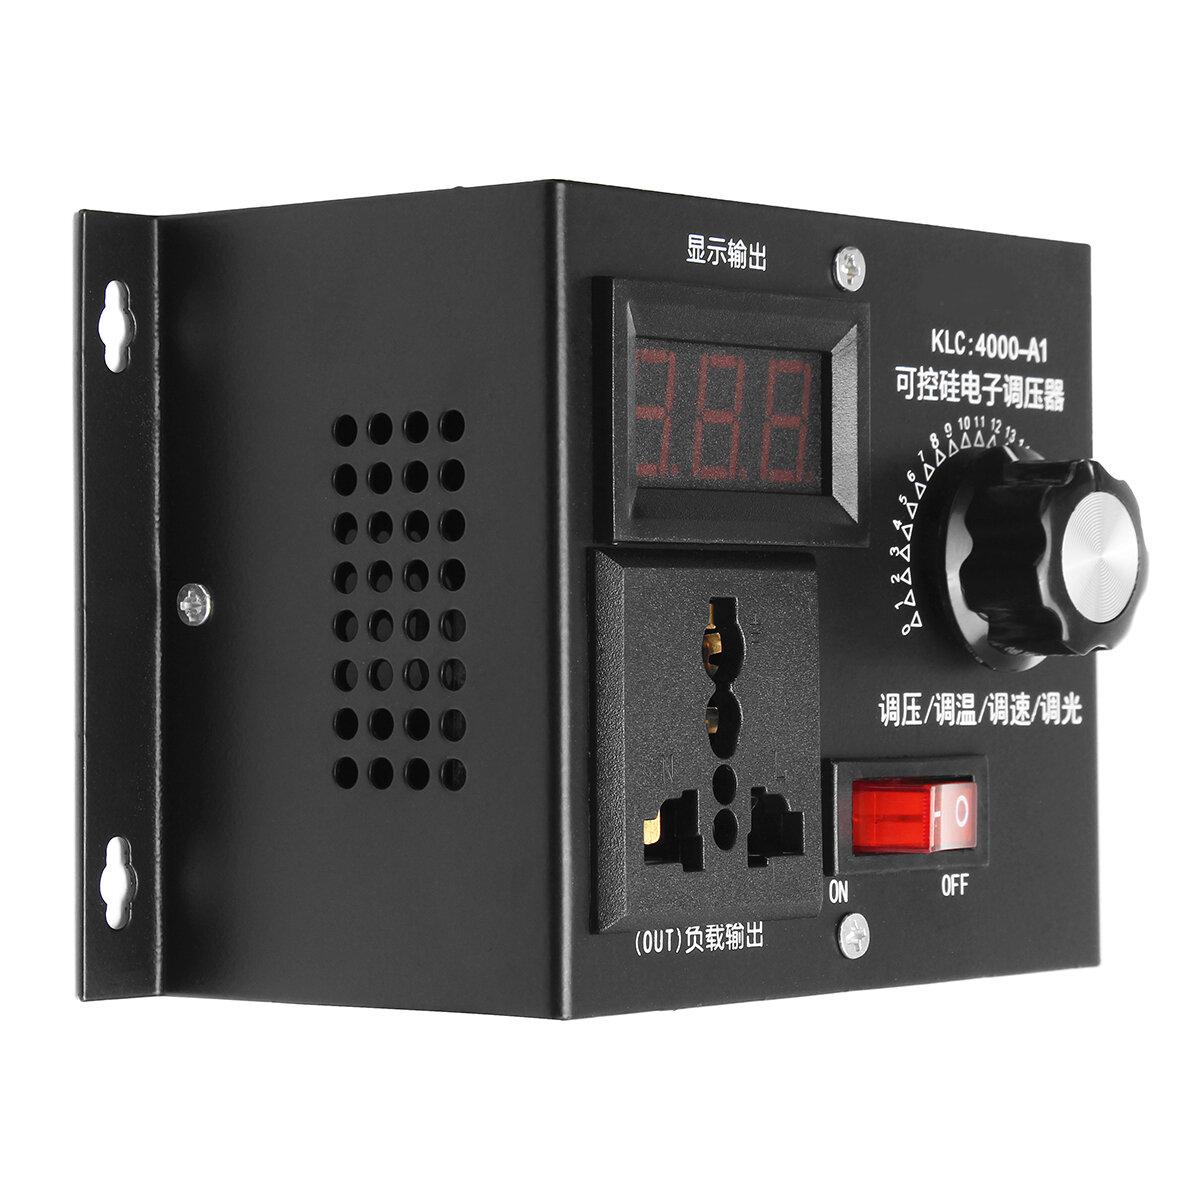 220V 4000W Universal Motor Speed Controller Variable Voltage Speed Regulator LED Display Motor Control Dimmer